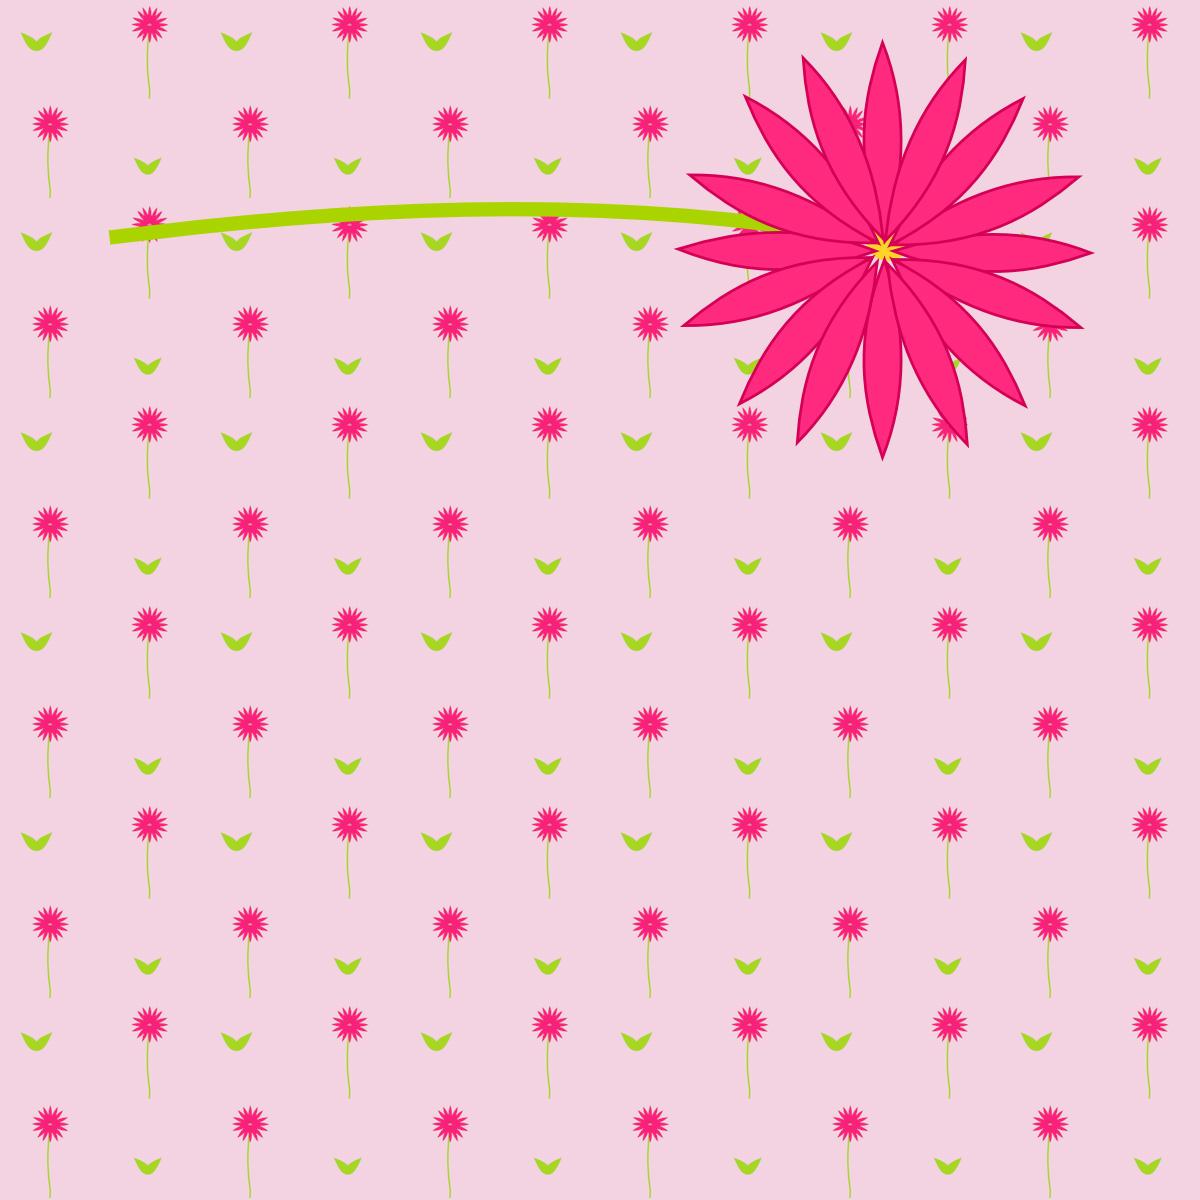 Free digital pink scrapbooking paper and flower embellishment free digital pink scrapbooking paper and flower embellishment clipart blume und papier freebie mightylinksfo